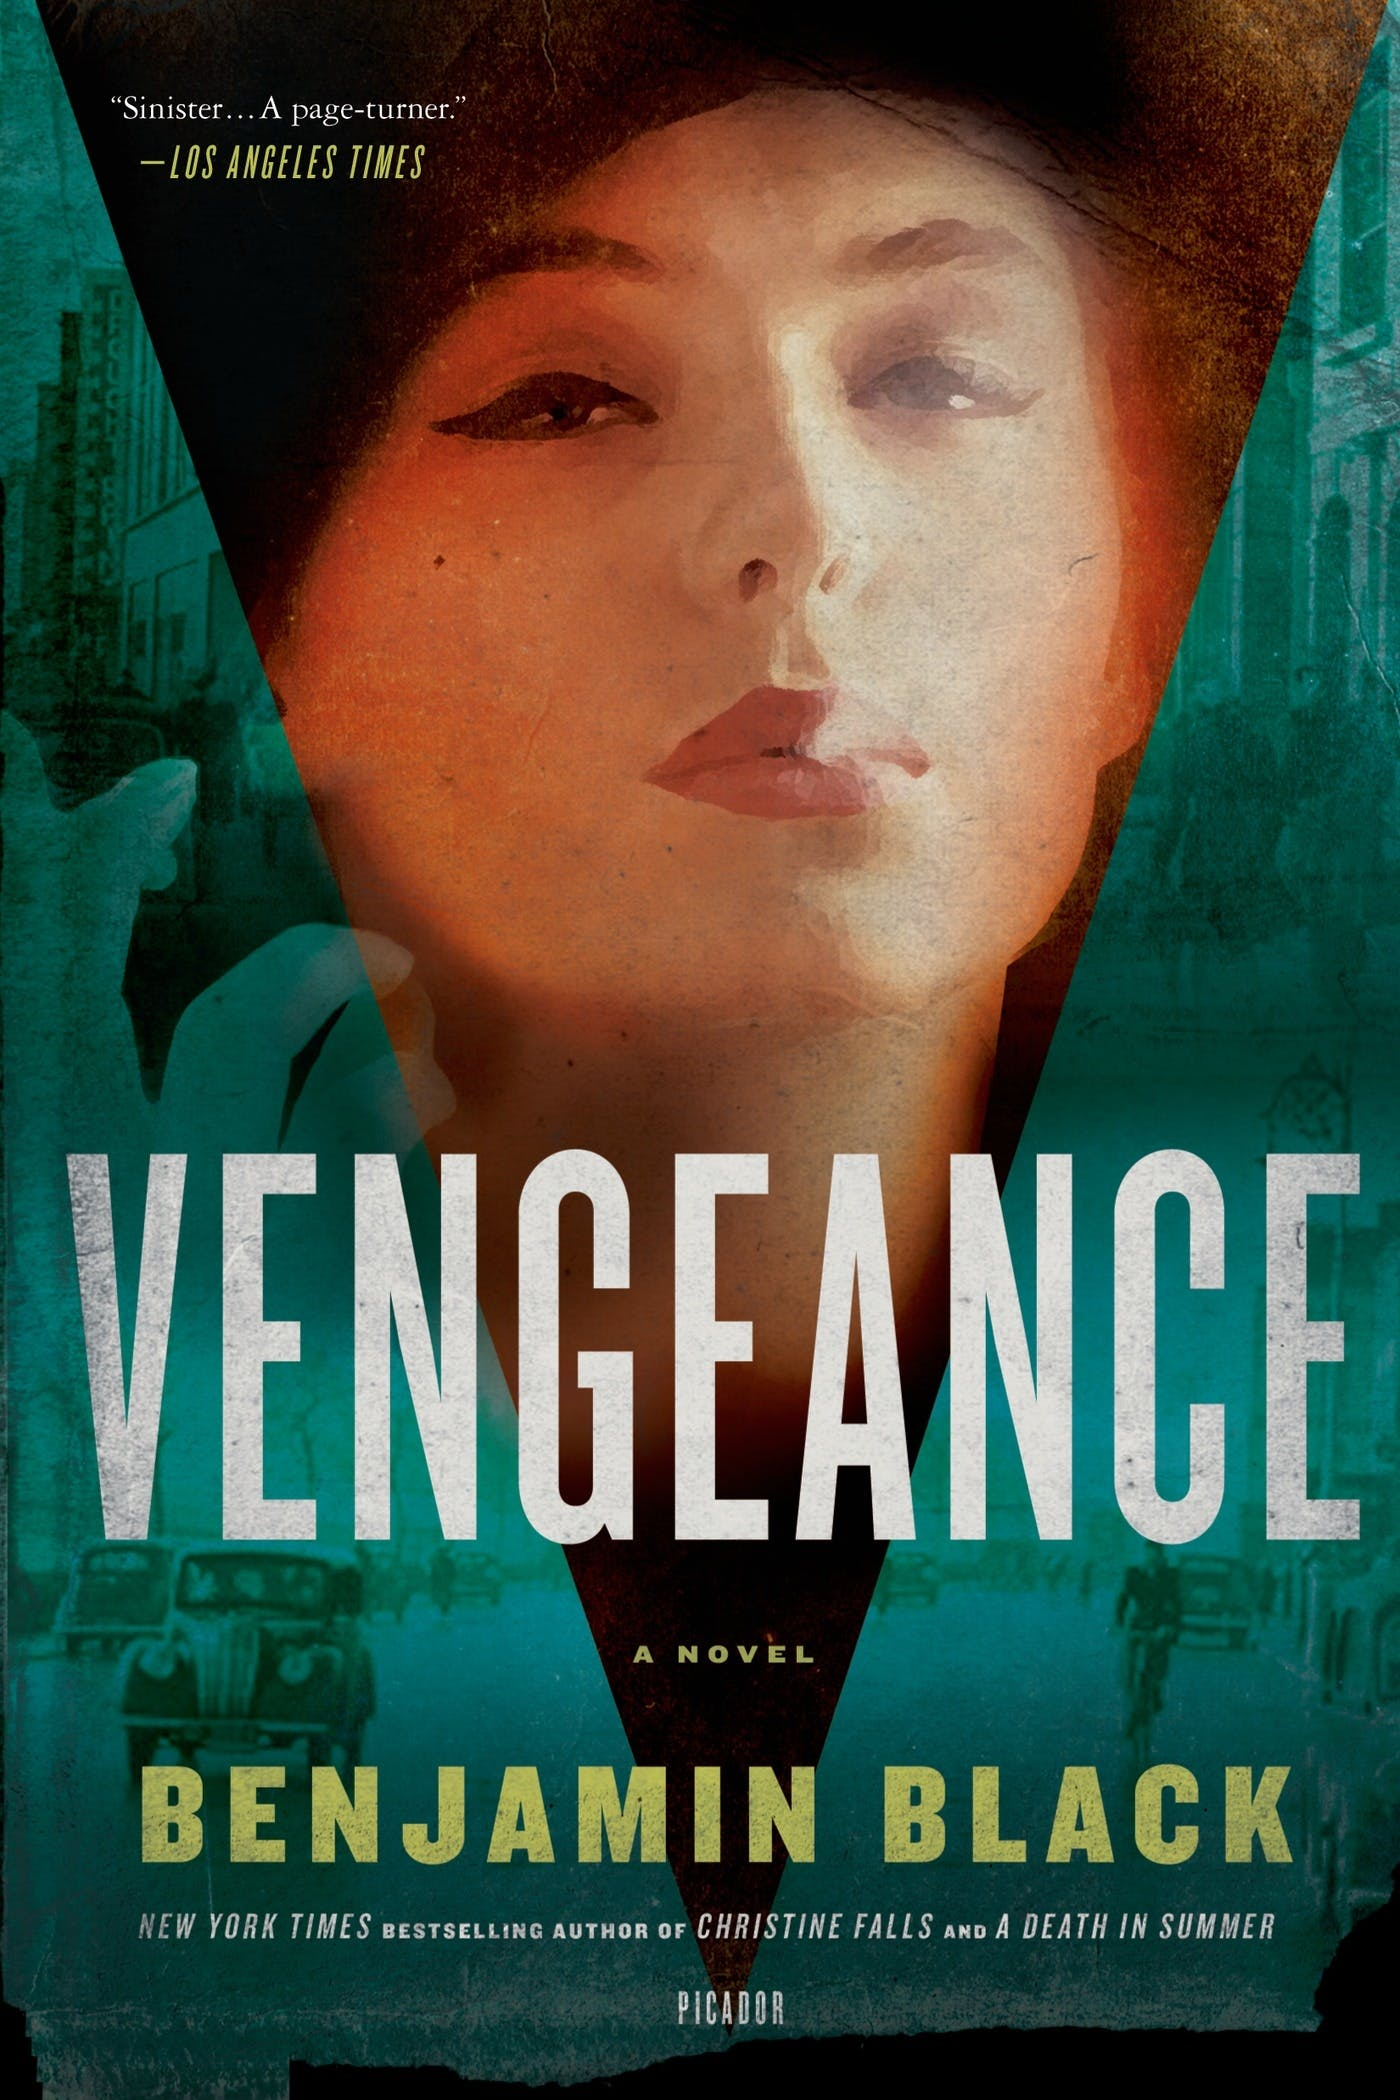 Image of Vengeance